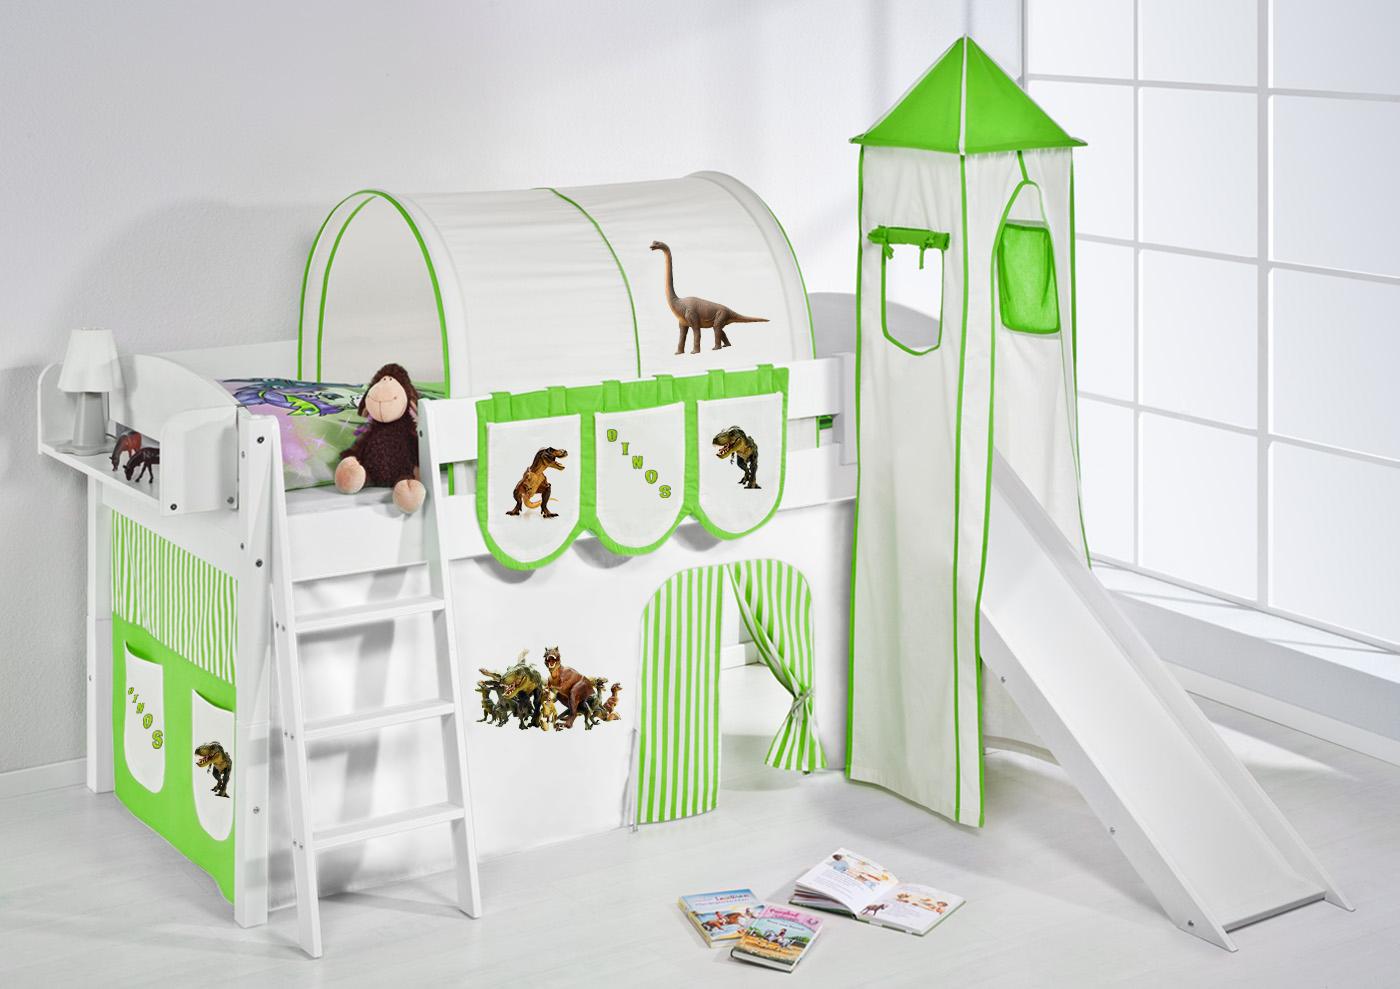 Fantastisch Dinosaurier Kinderbett Rahmen Ideen - Rahmen Ideen ...